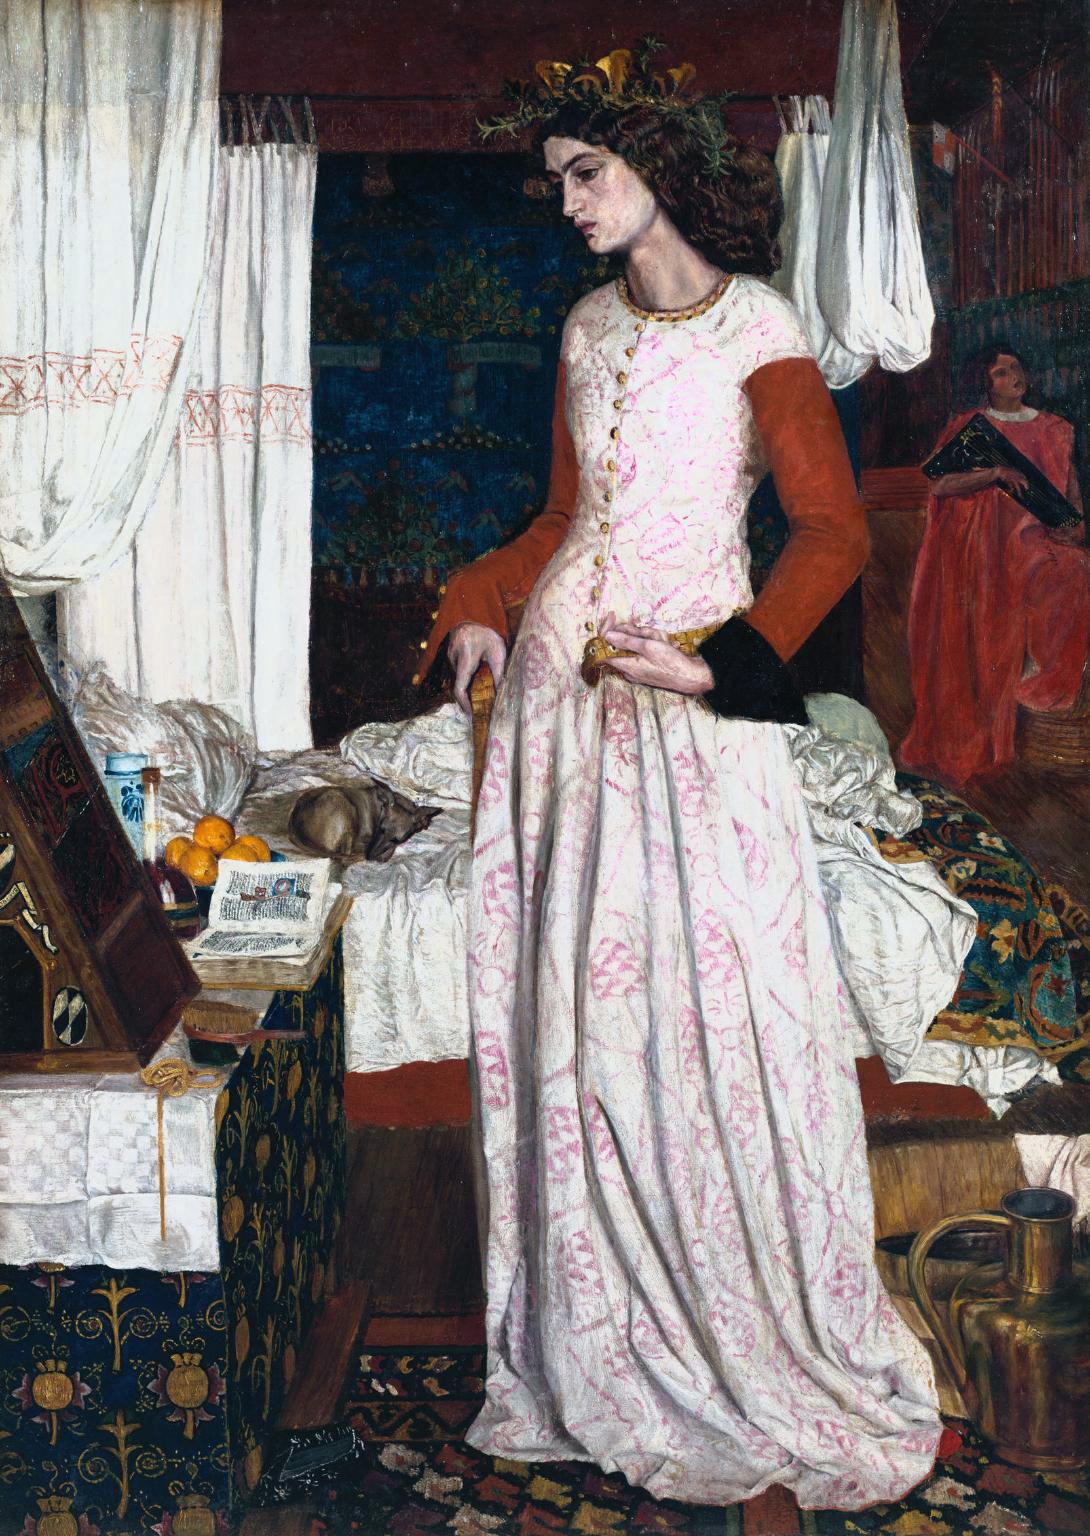 Morris's painting La belle Iseult, also inaccu...